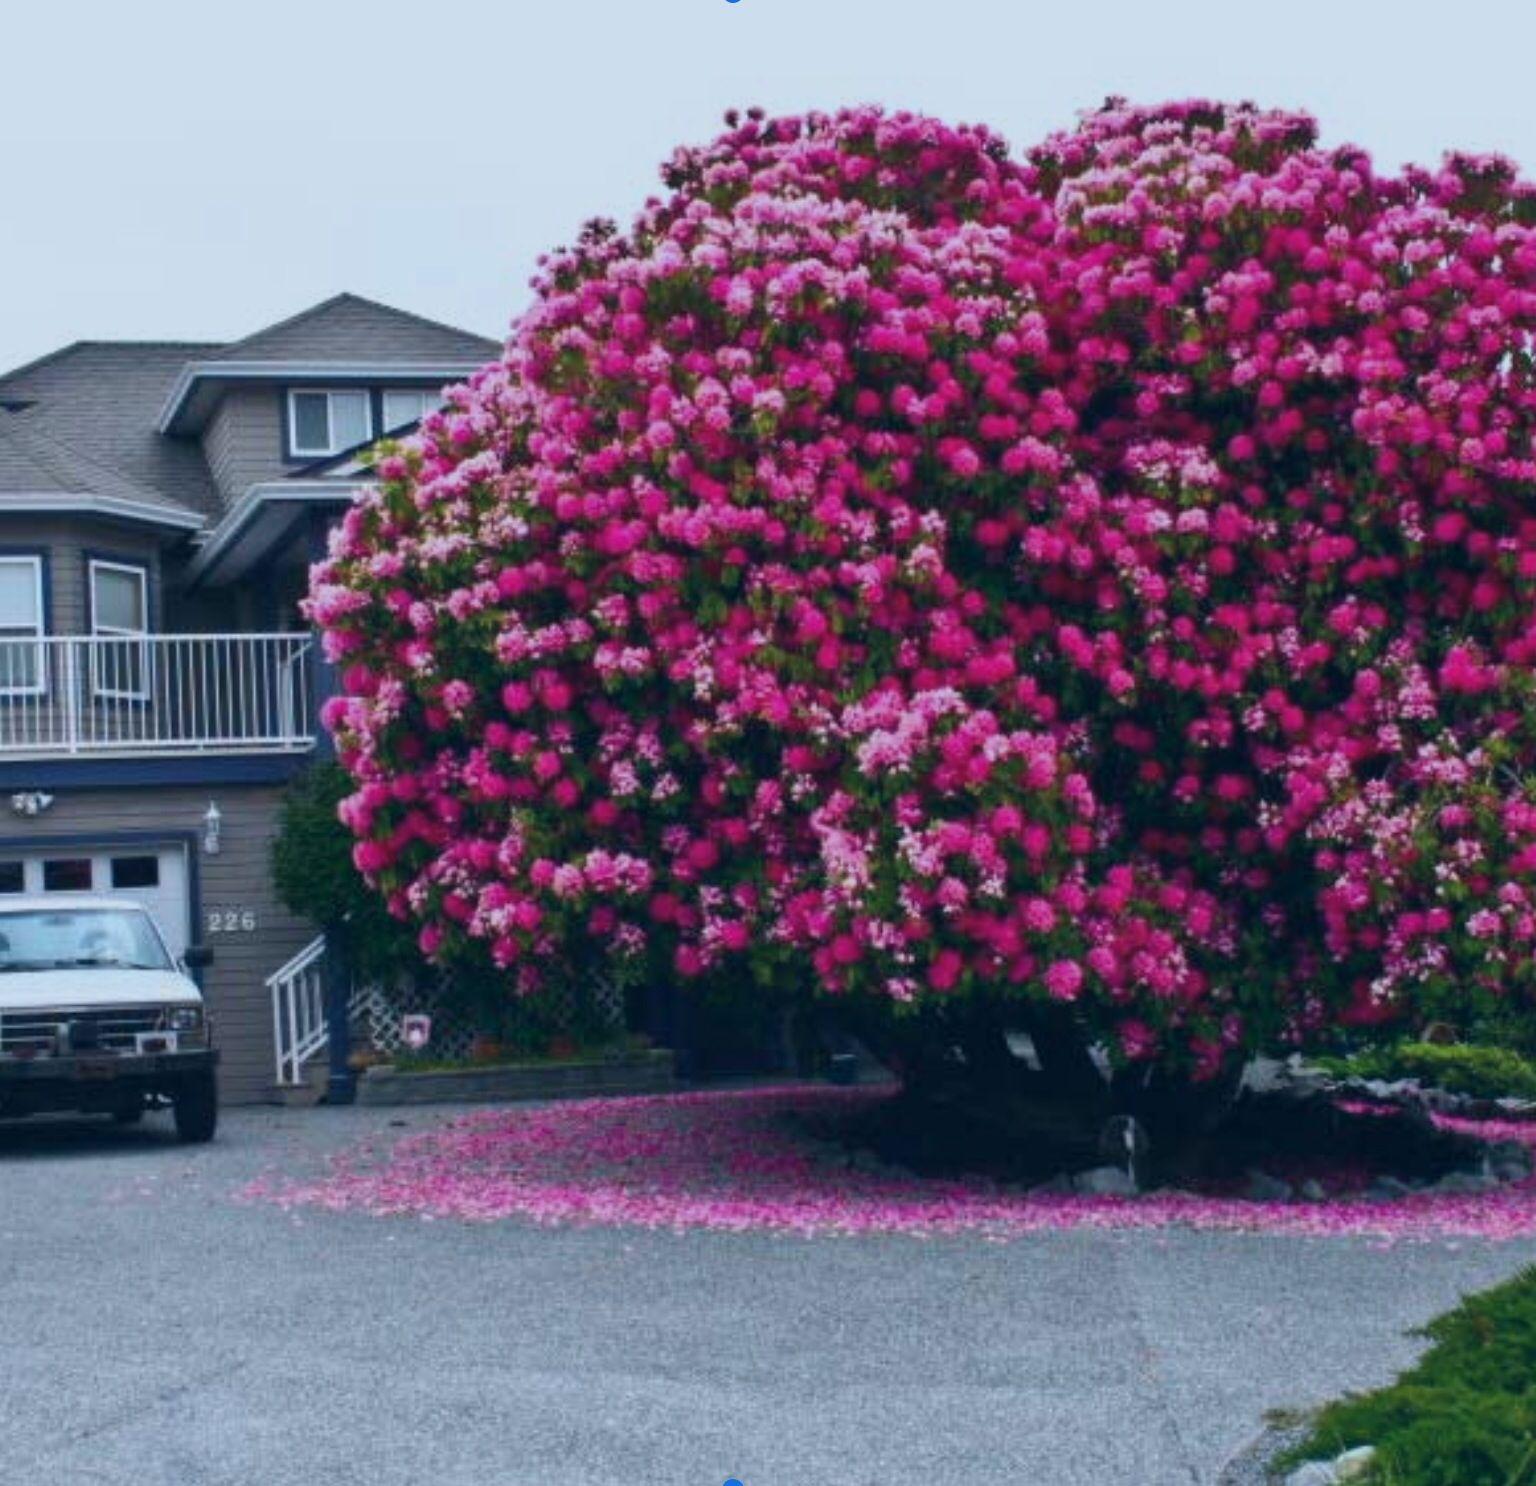 Rododendro trees in bloom arboles con flor pinterest - Rododendro arbol ...